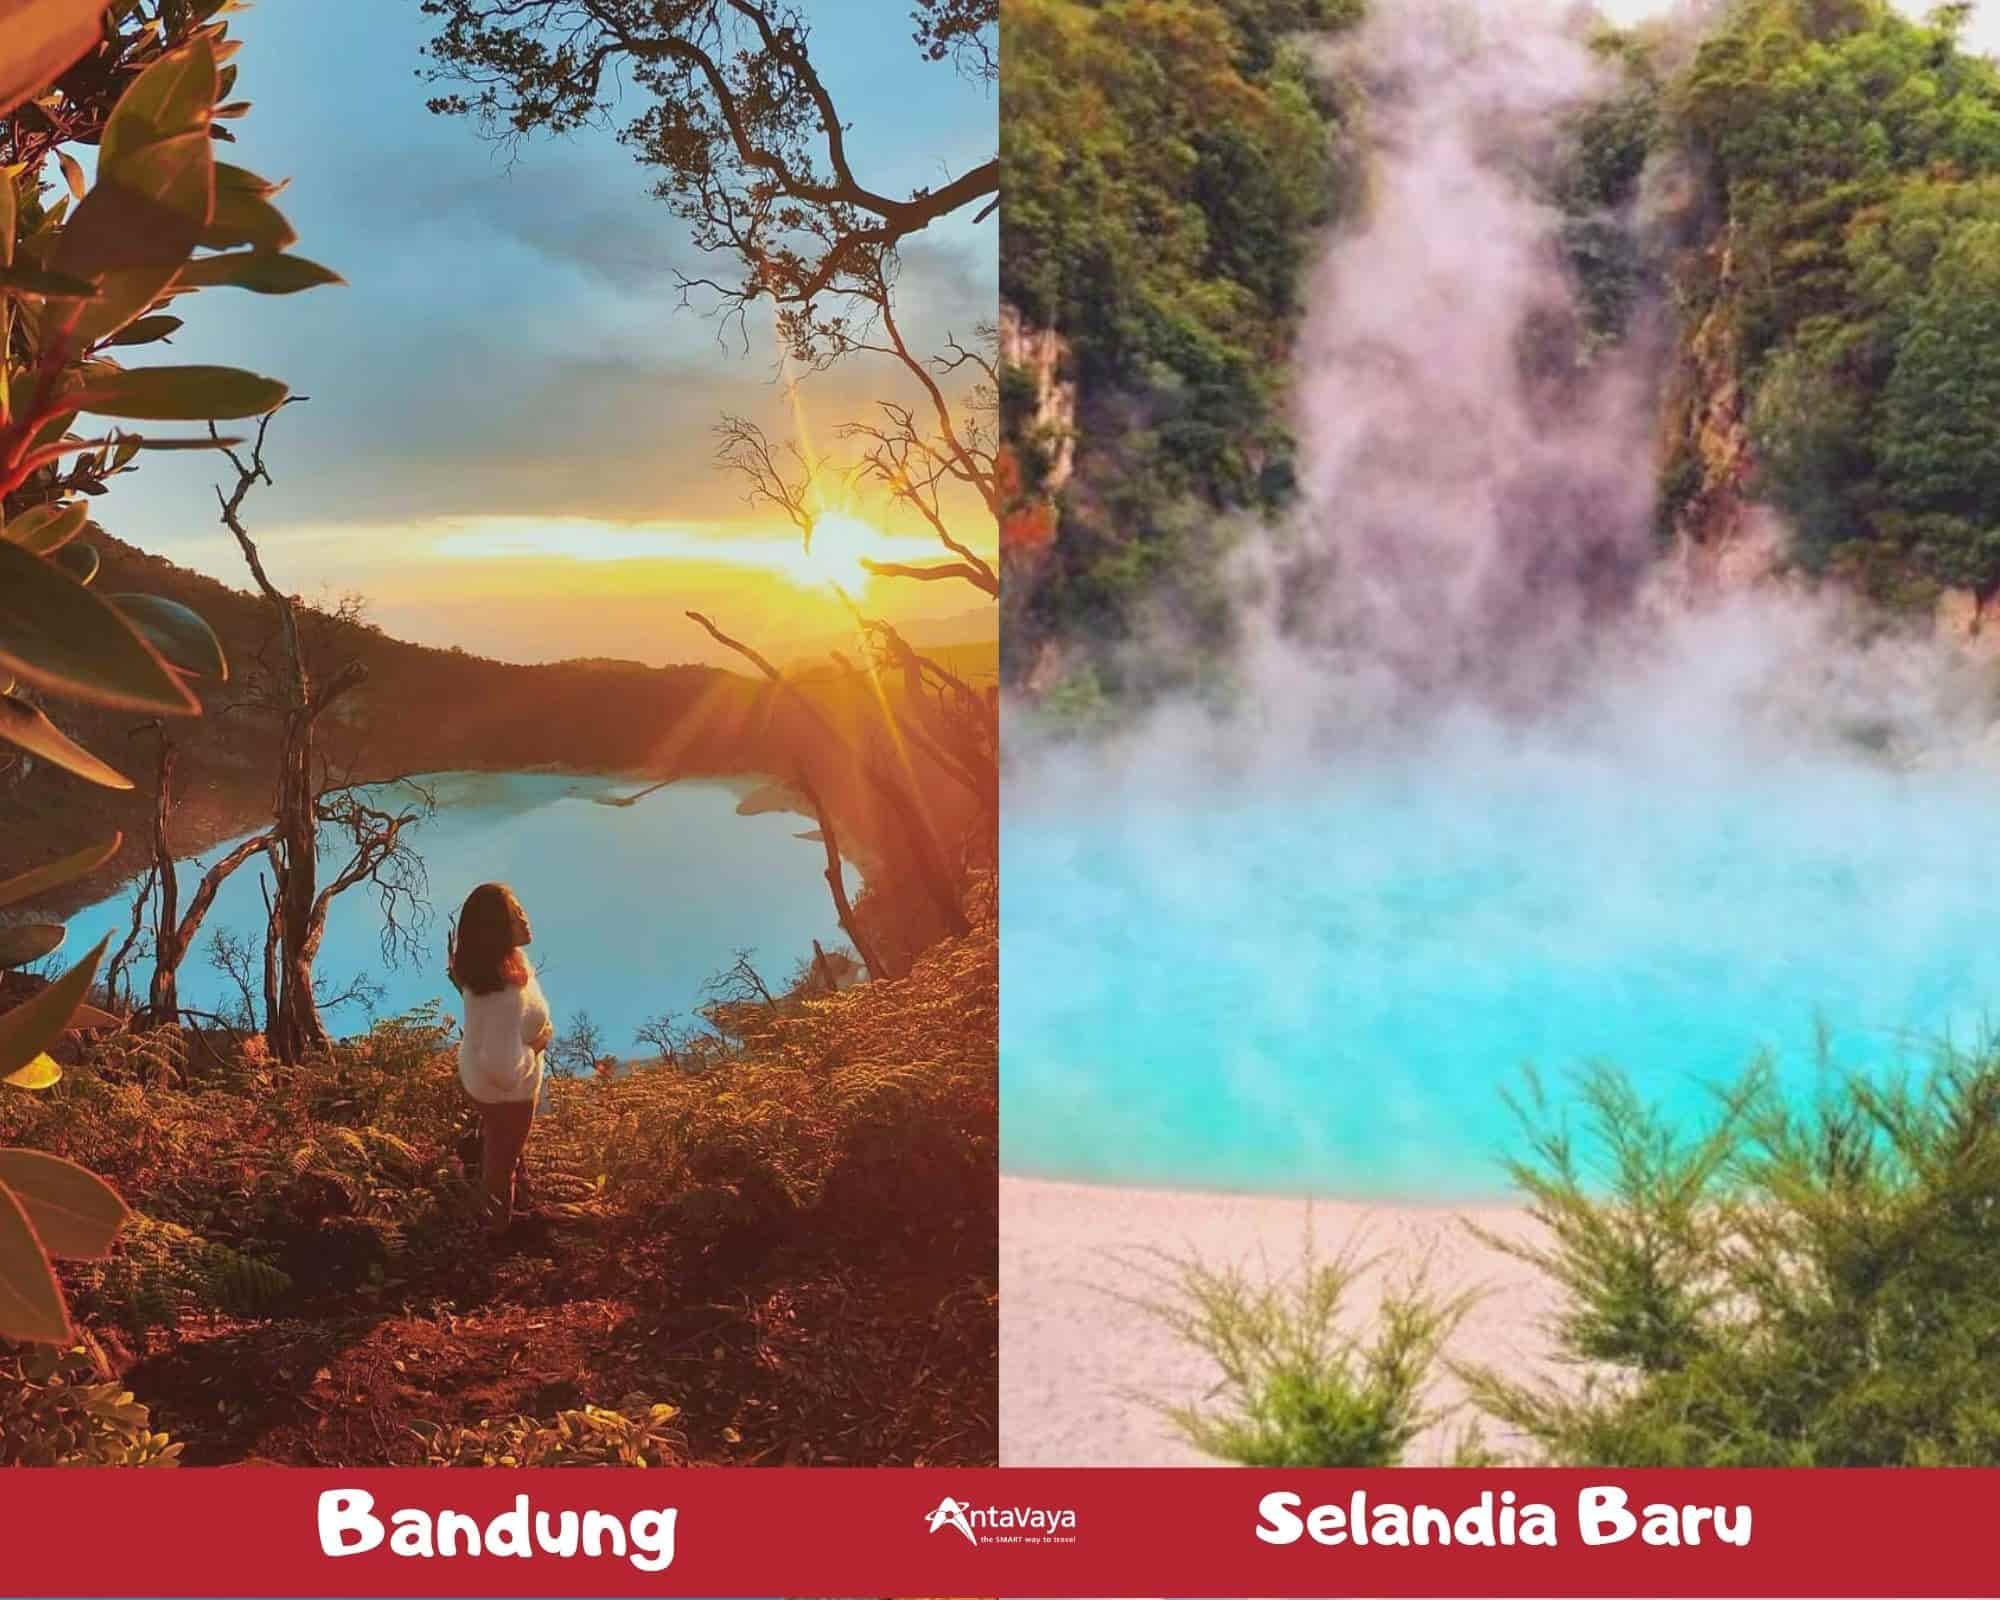 Destinasi Dalam Negeri Rasa Luar Negeri - Sumber Instagram nizamrullah dan Chloeskafte